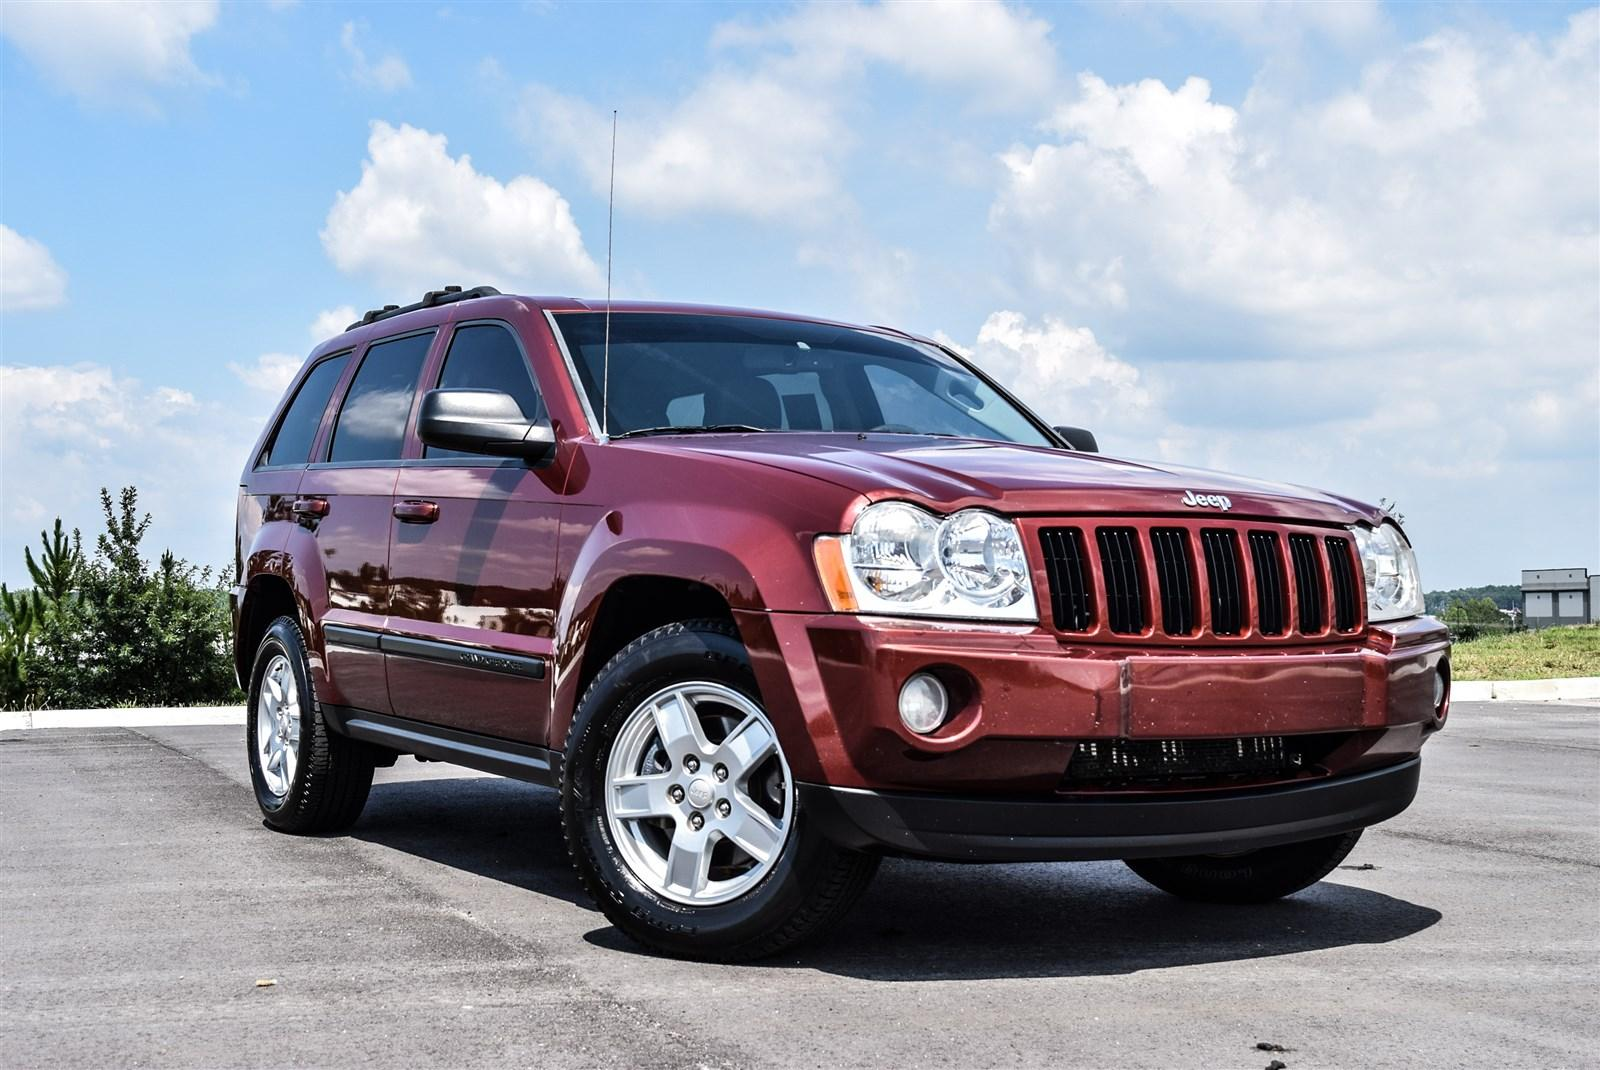 2007 Jeep Grand Cherokee Laredo Stock 697504 For Sale